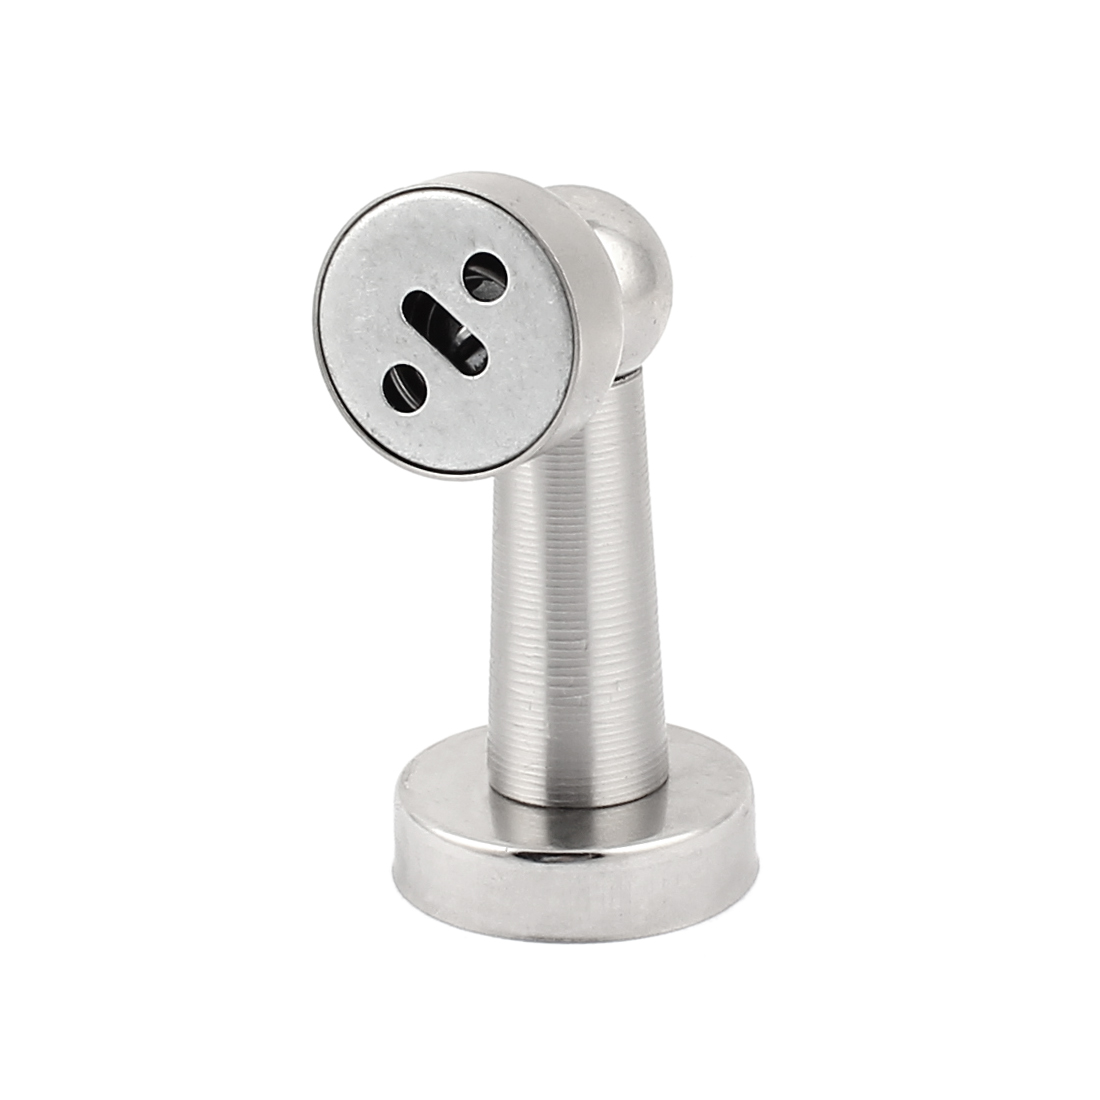 Round Strike Base Magnetic Catch Door Stop Stopper Doorstop Holder Keeper 75mm - image 1 of 4